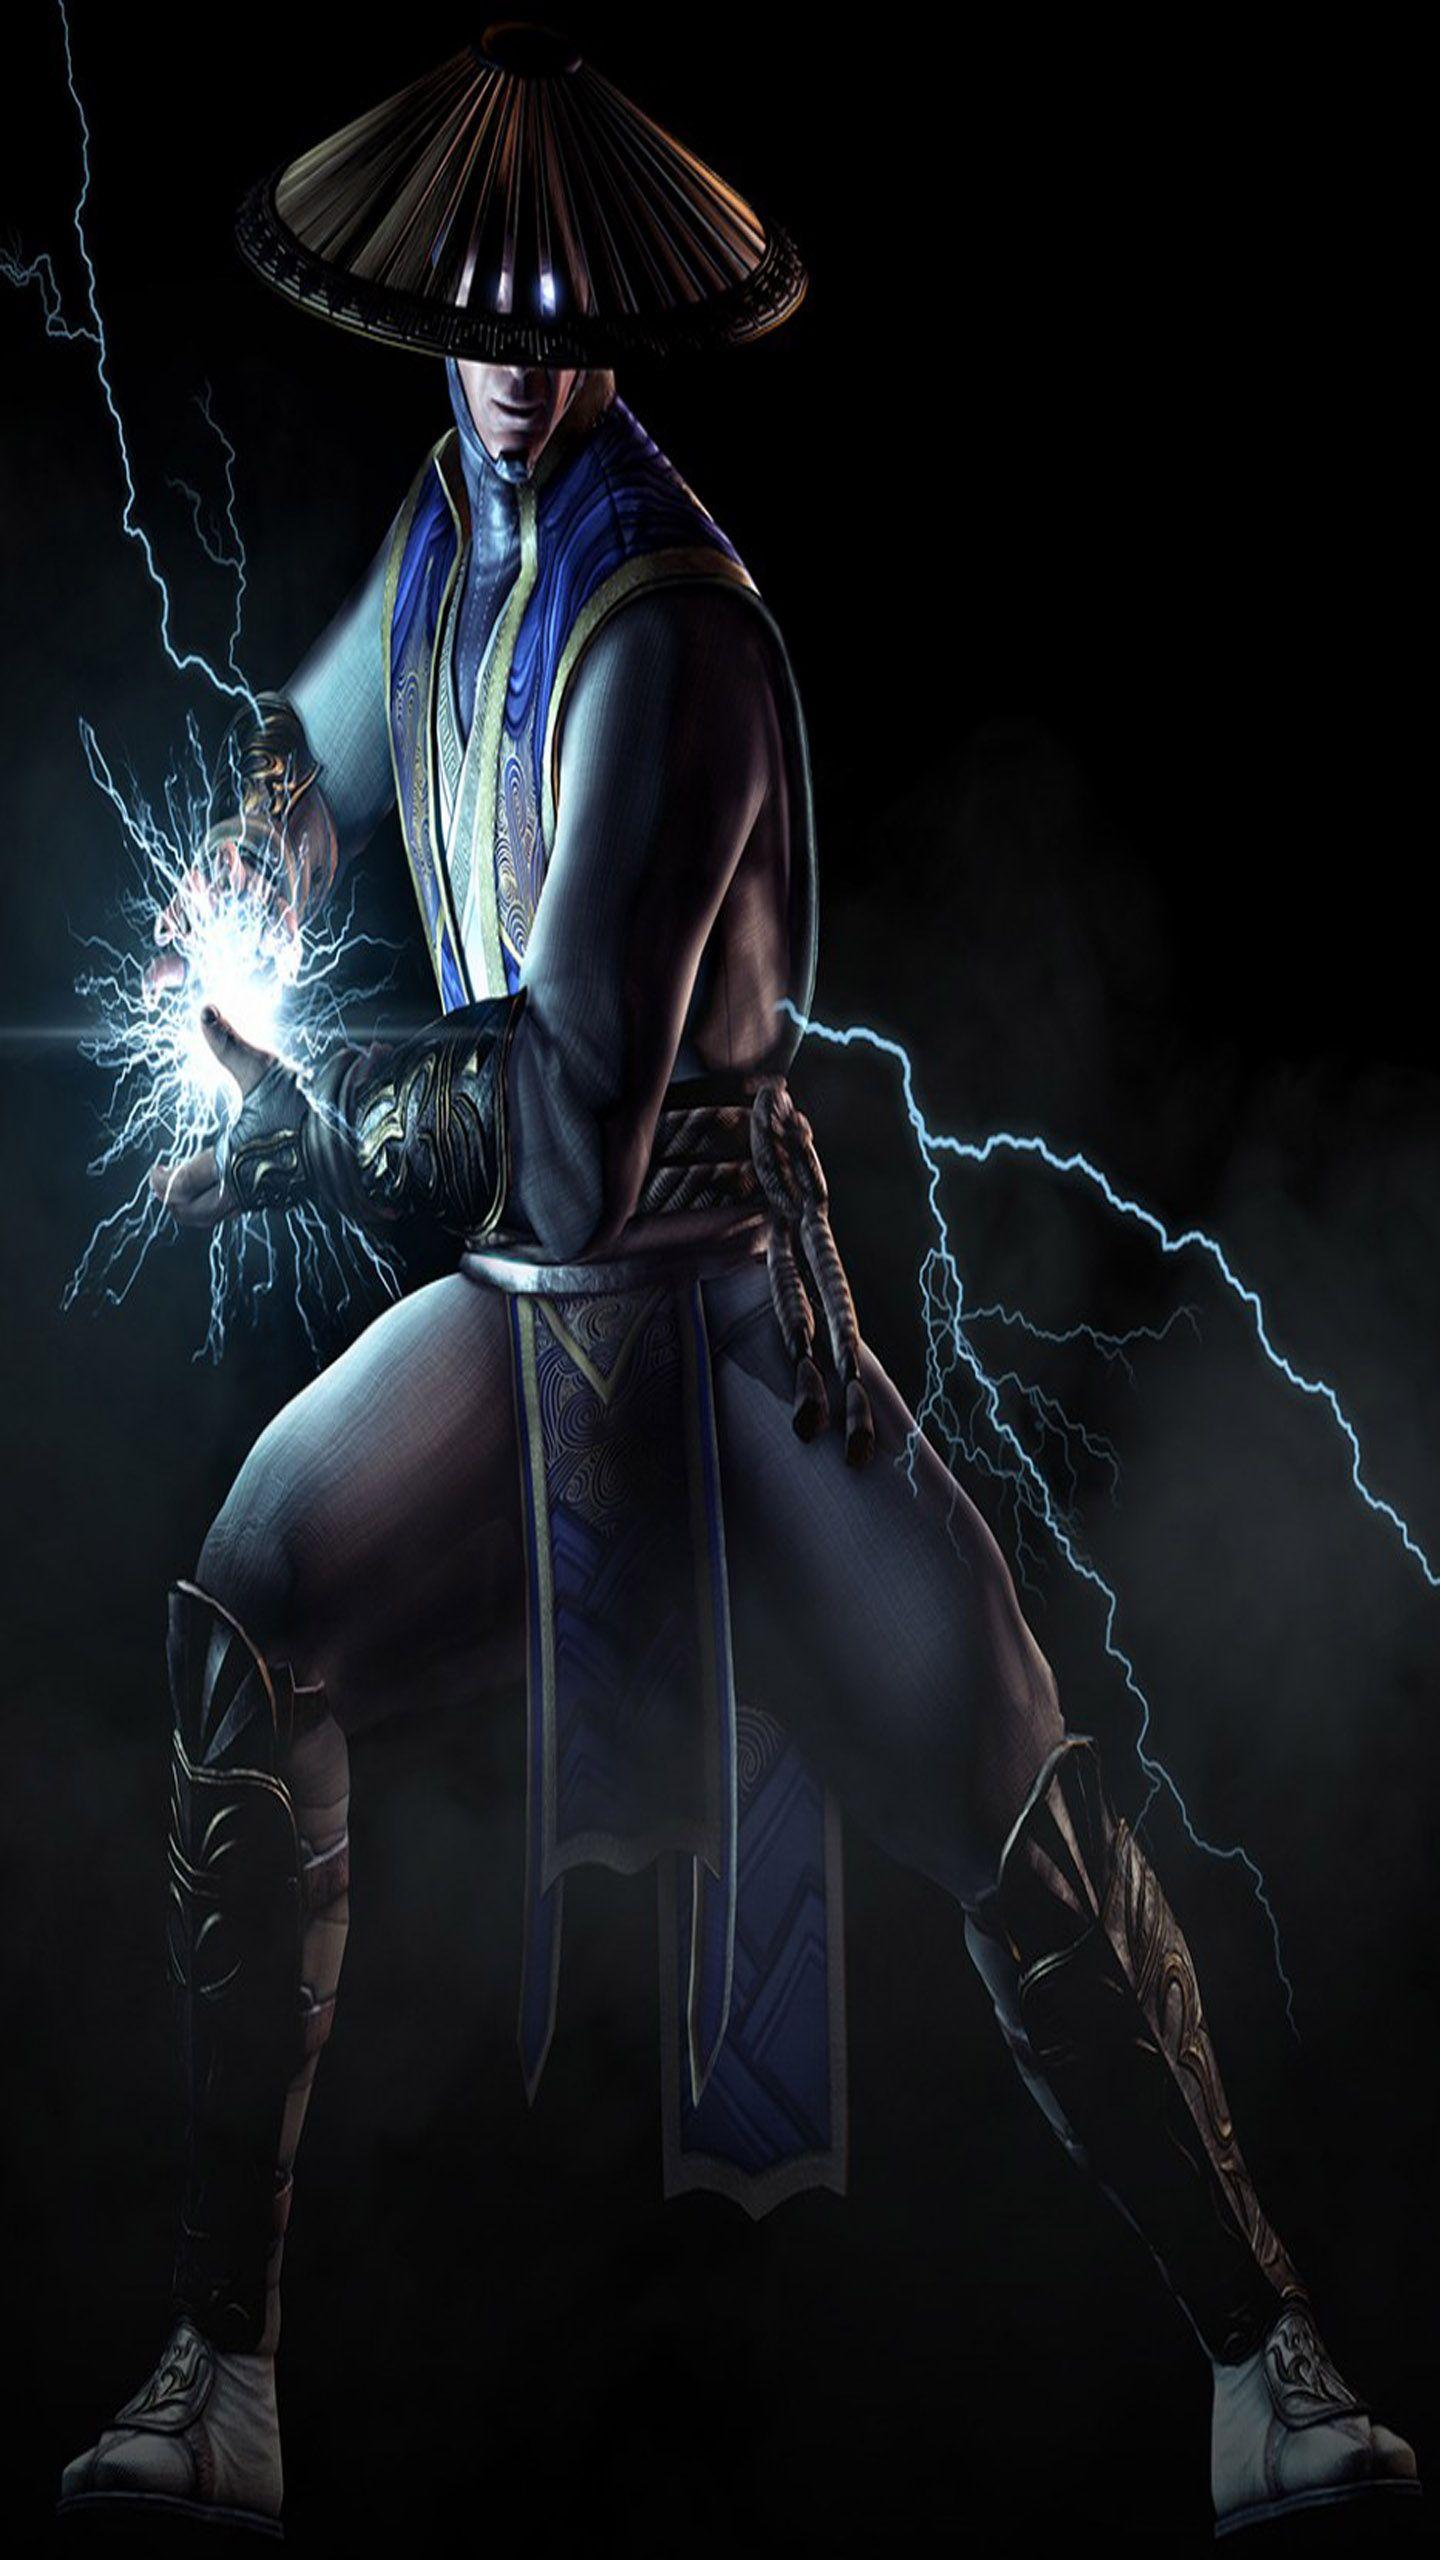 Mortal kombat X wallpaper for Samsung Galaxy S6. Samsung